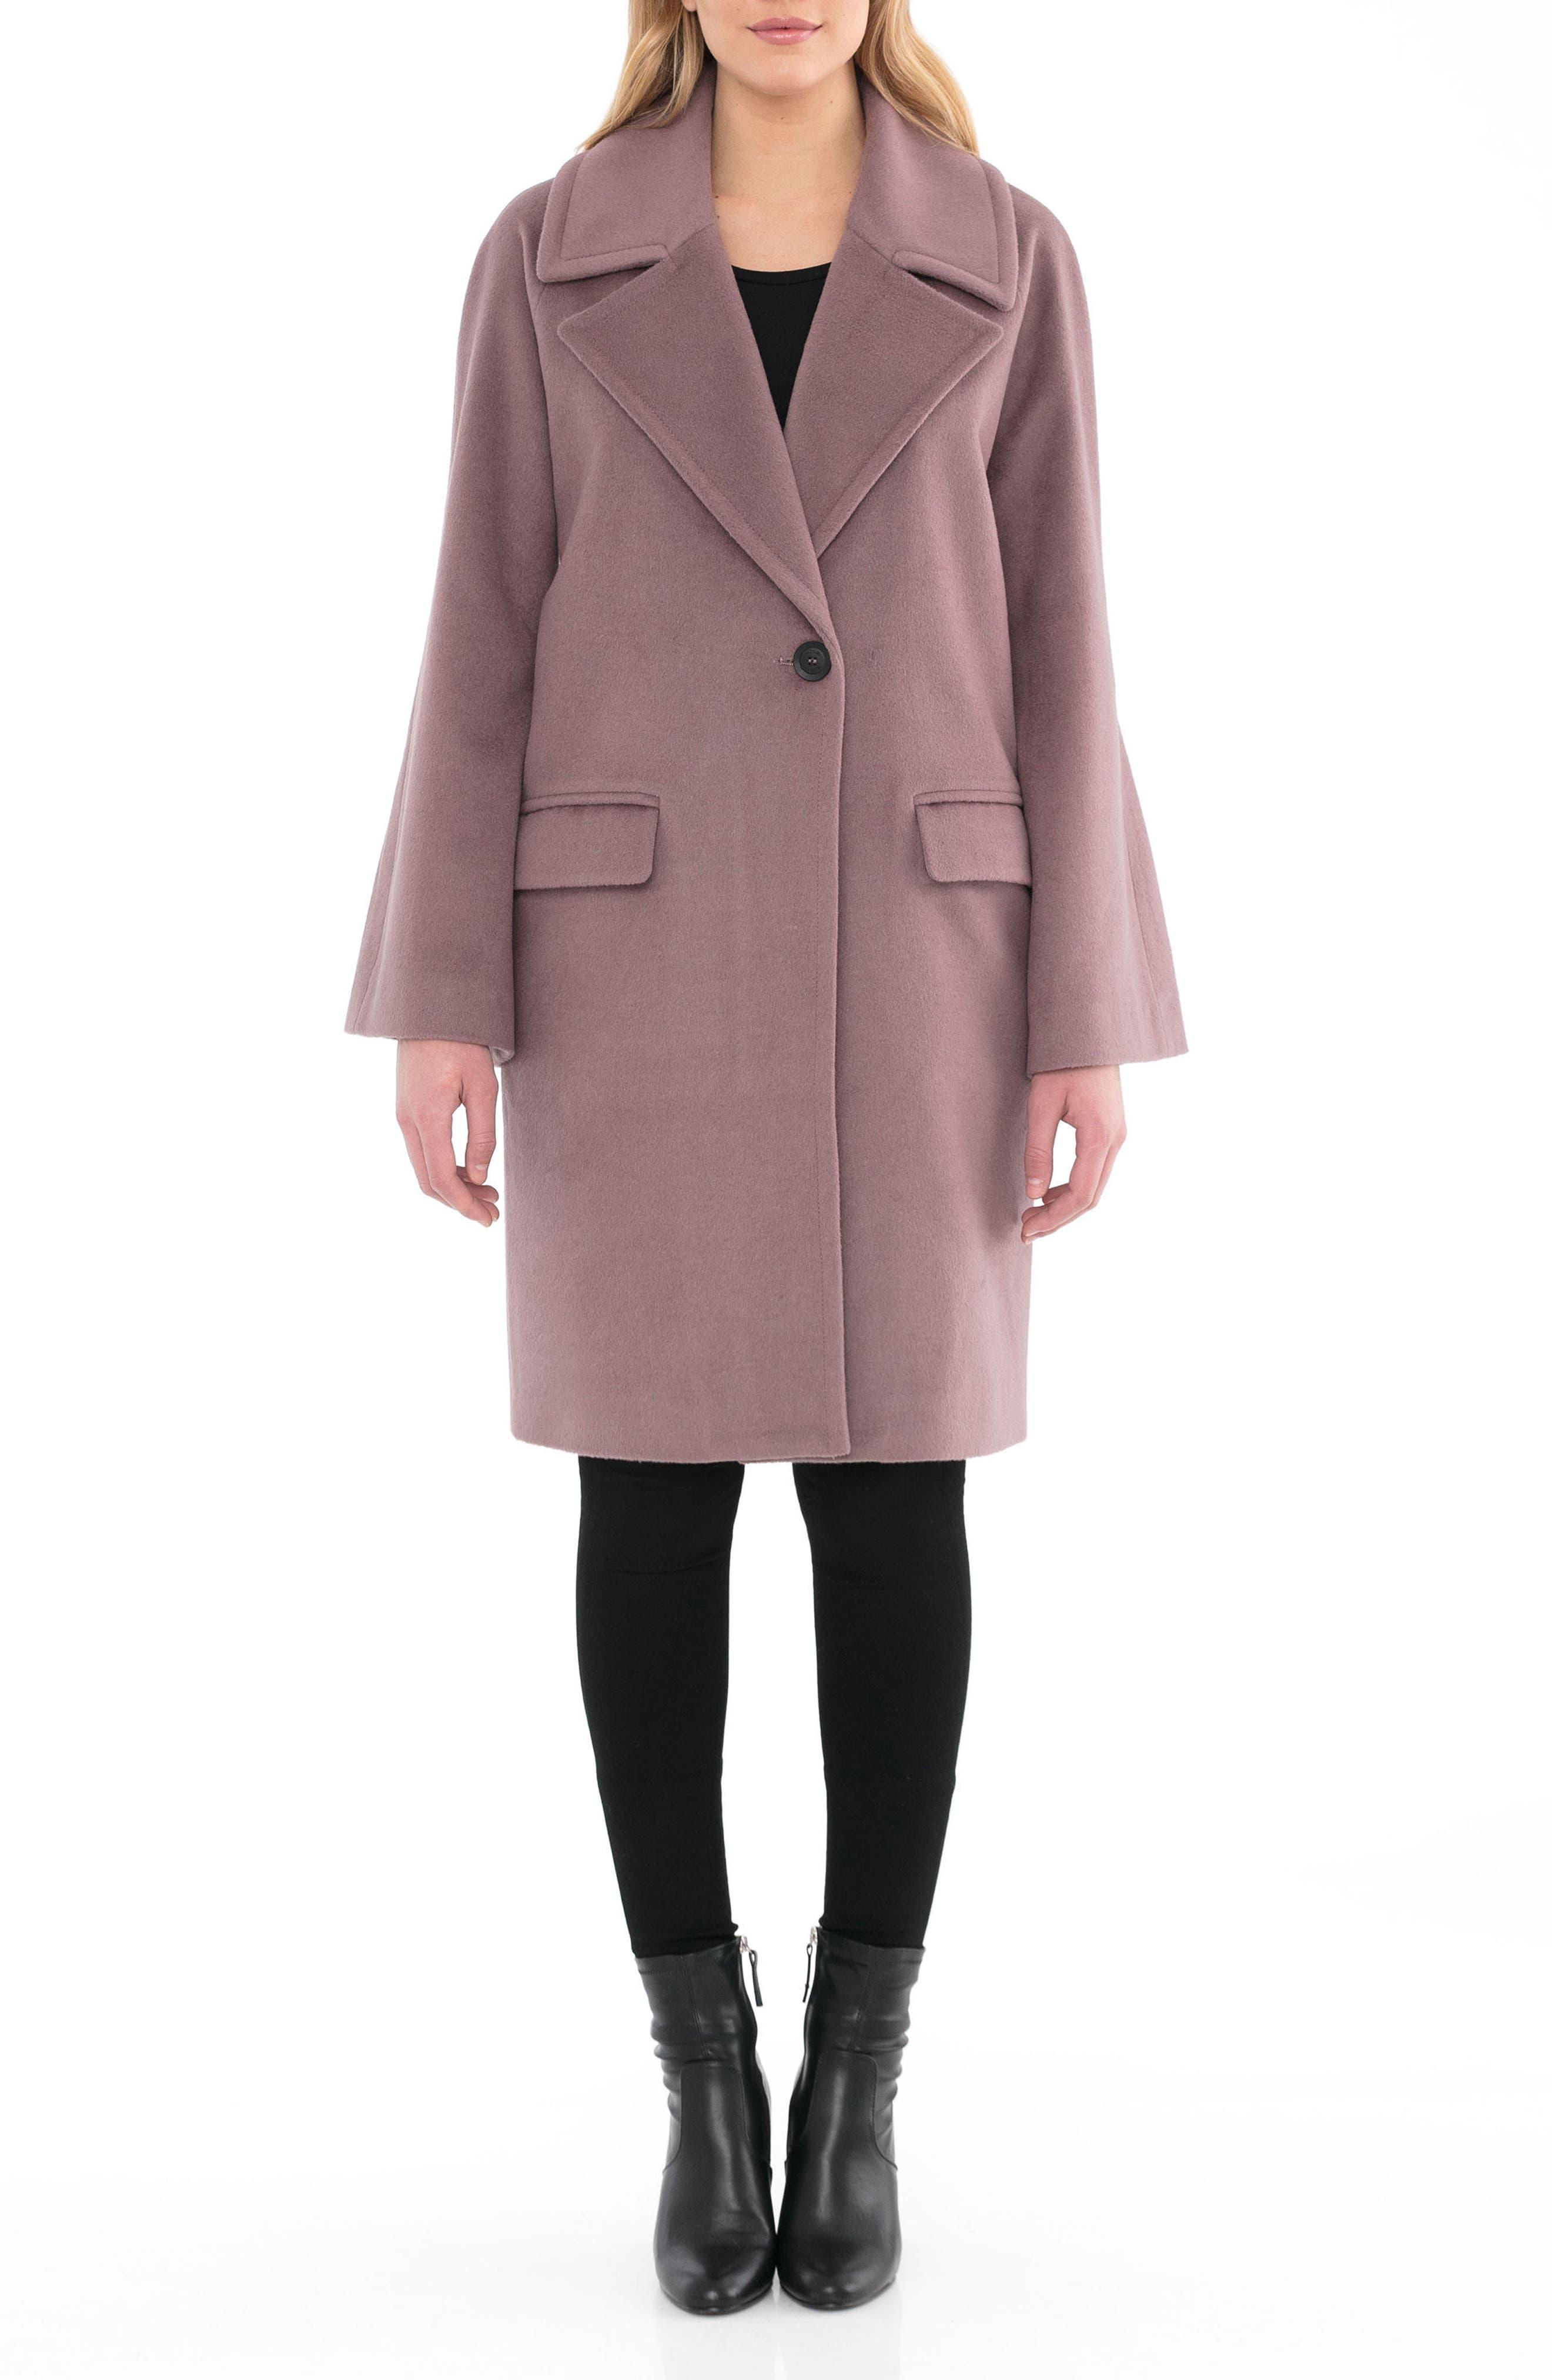 Badgley Mischka Bella Flare Sleeve Long Coat